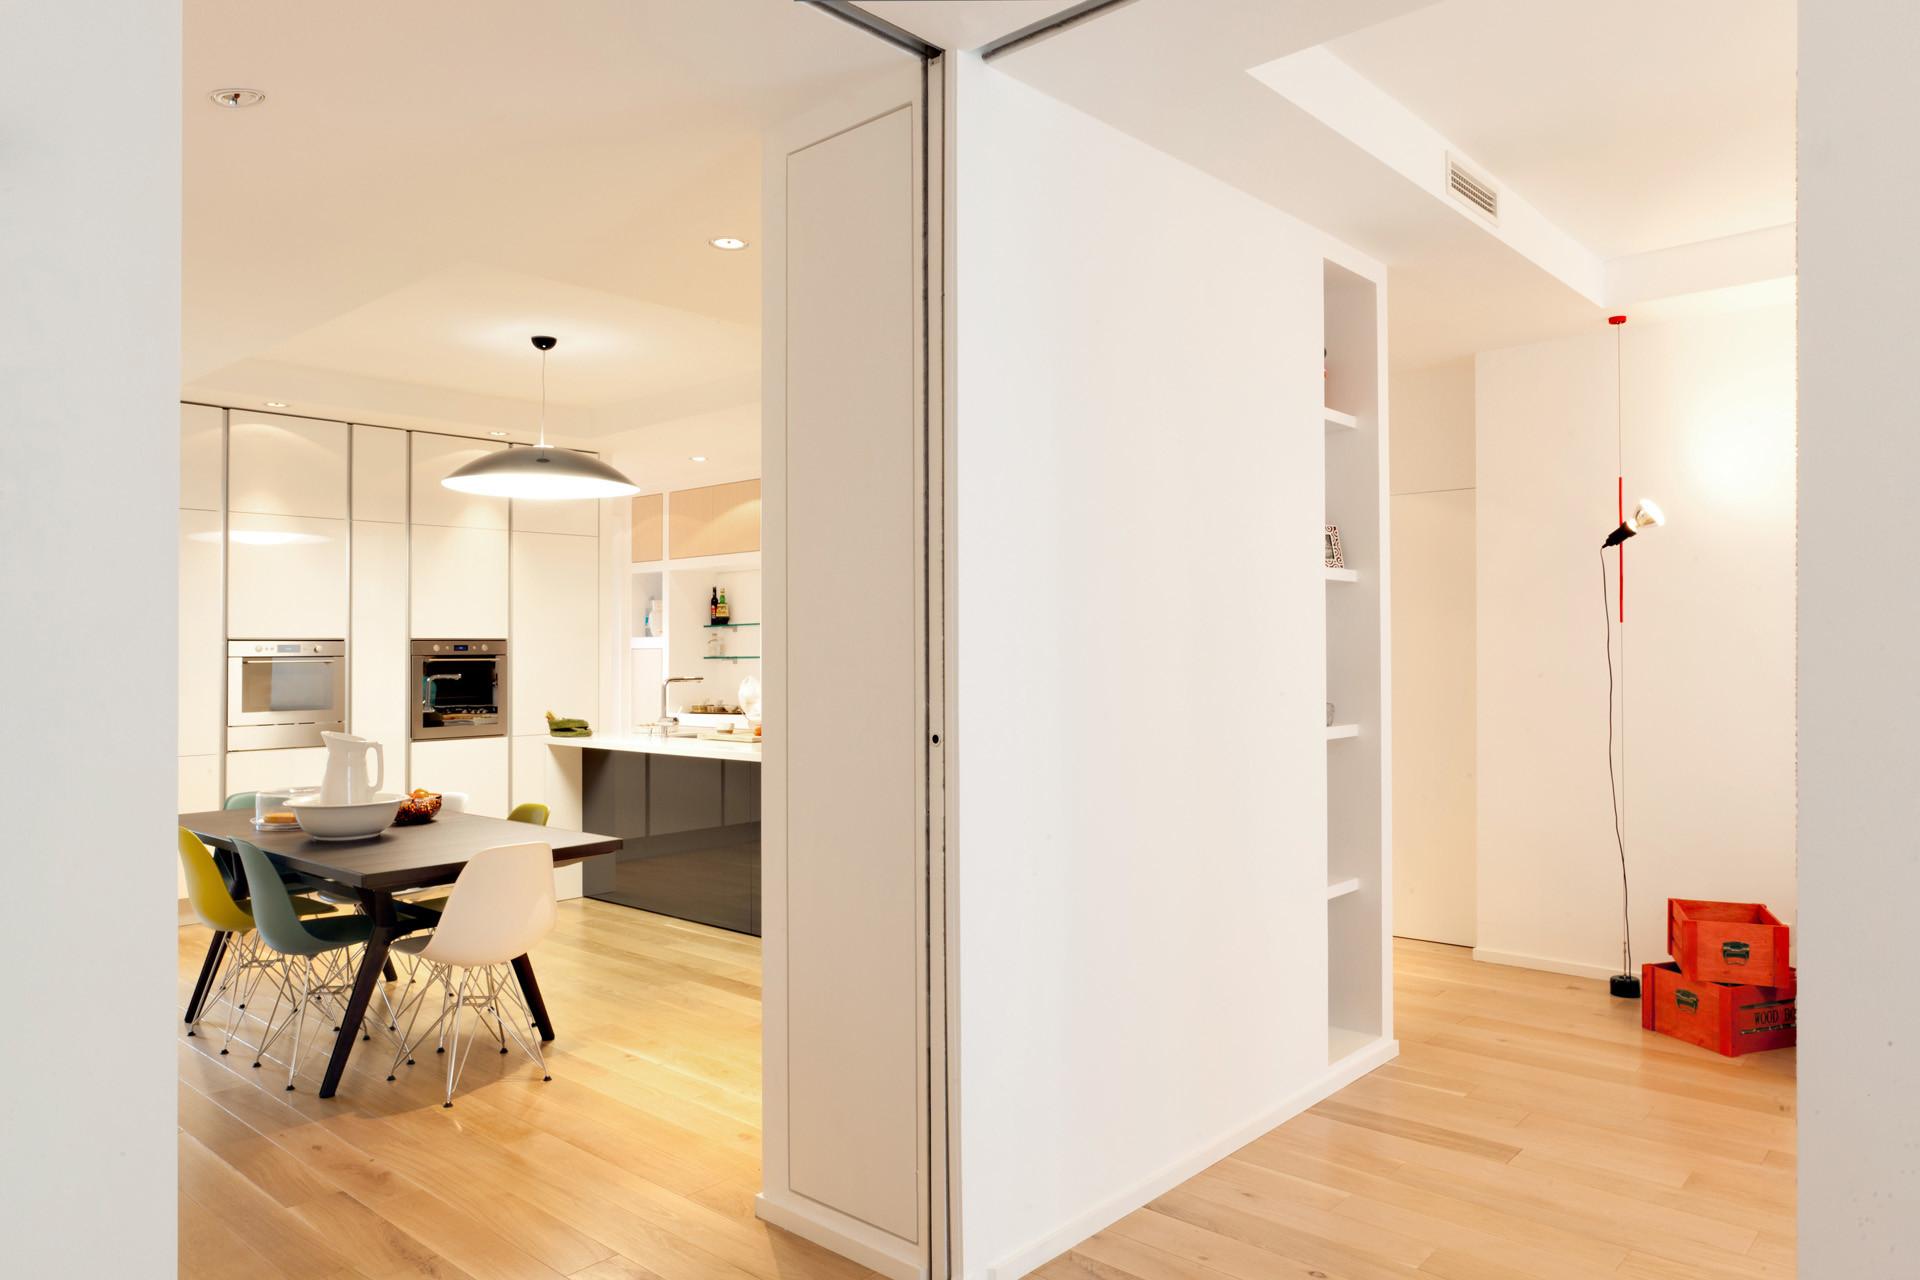 Wisp-Architects- Oxilia Apartment 9